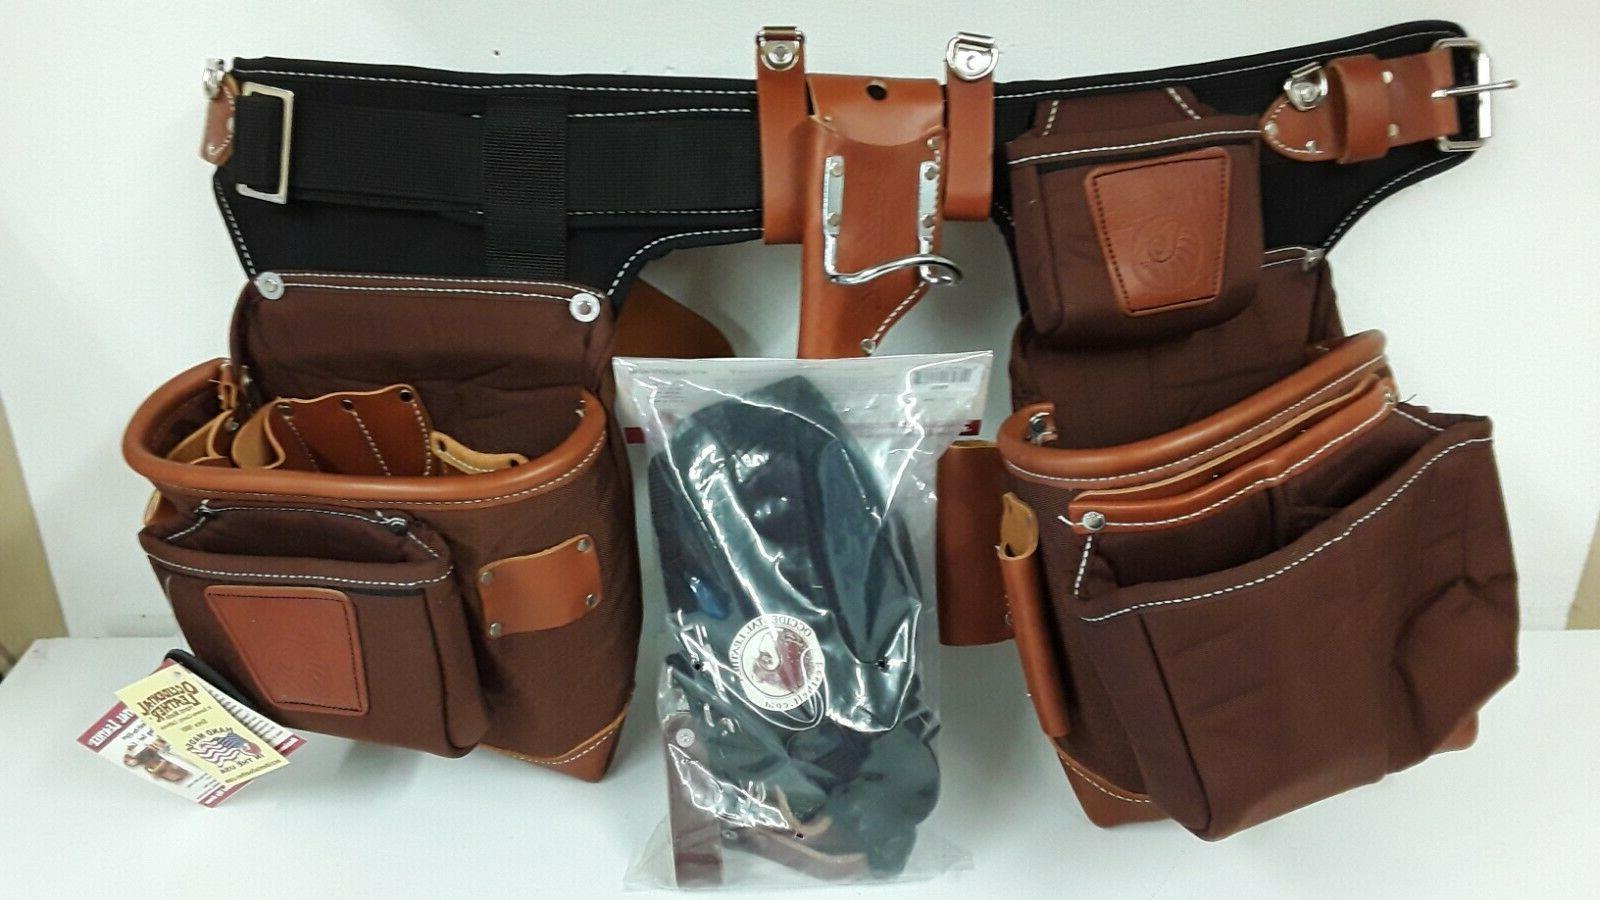 Occidental Leather 9855 Adjust-to-Fit Fat Lip Tool Bag Set -